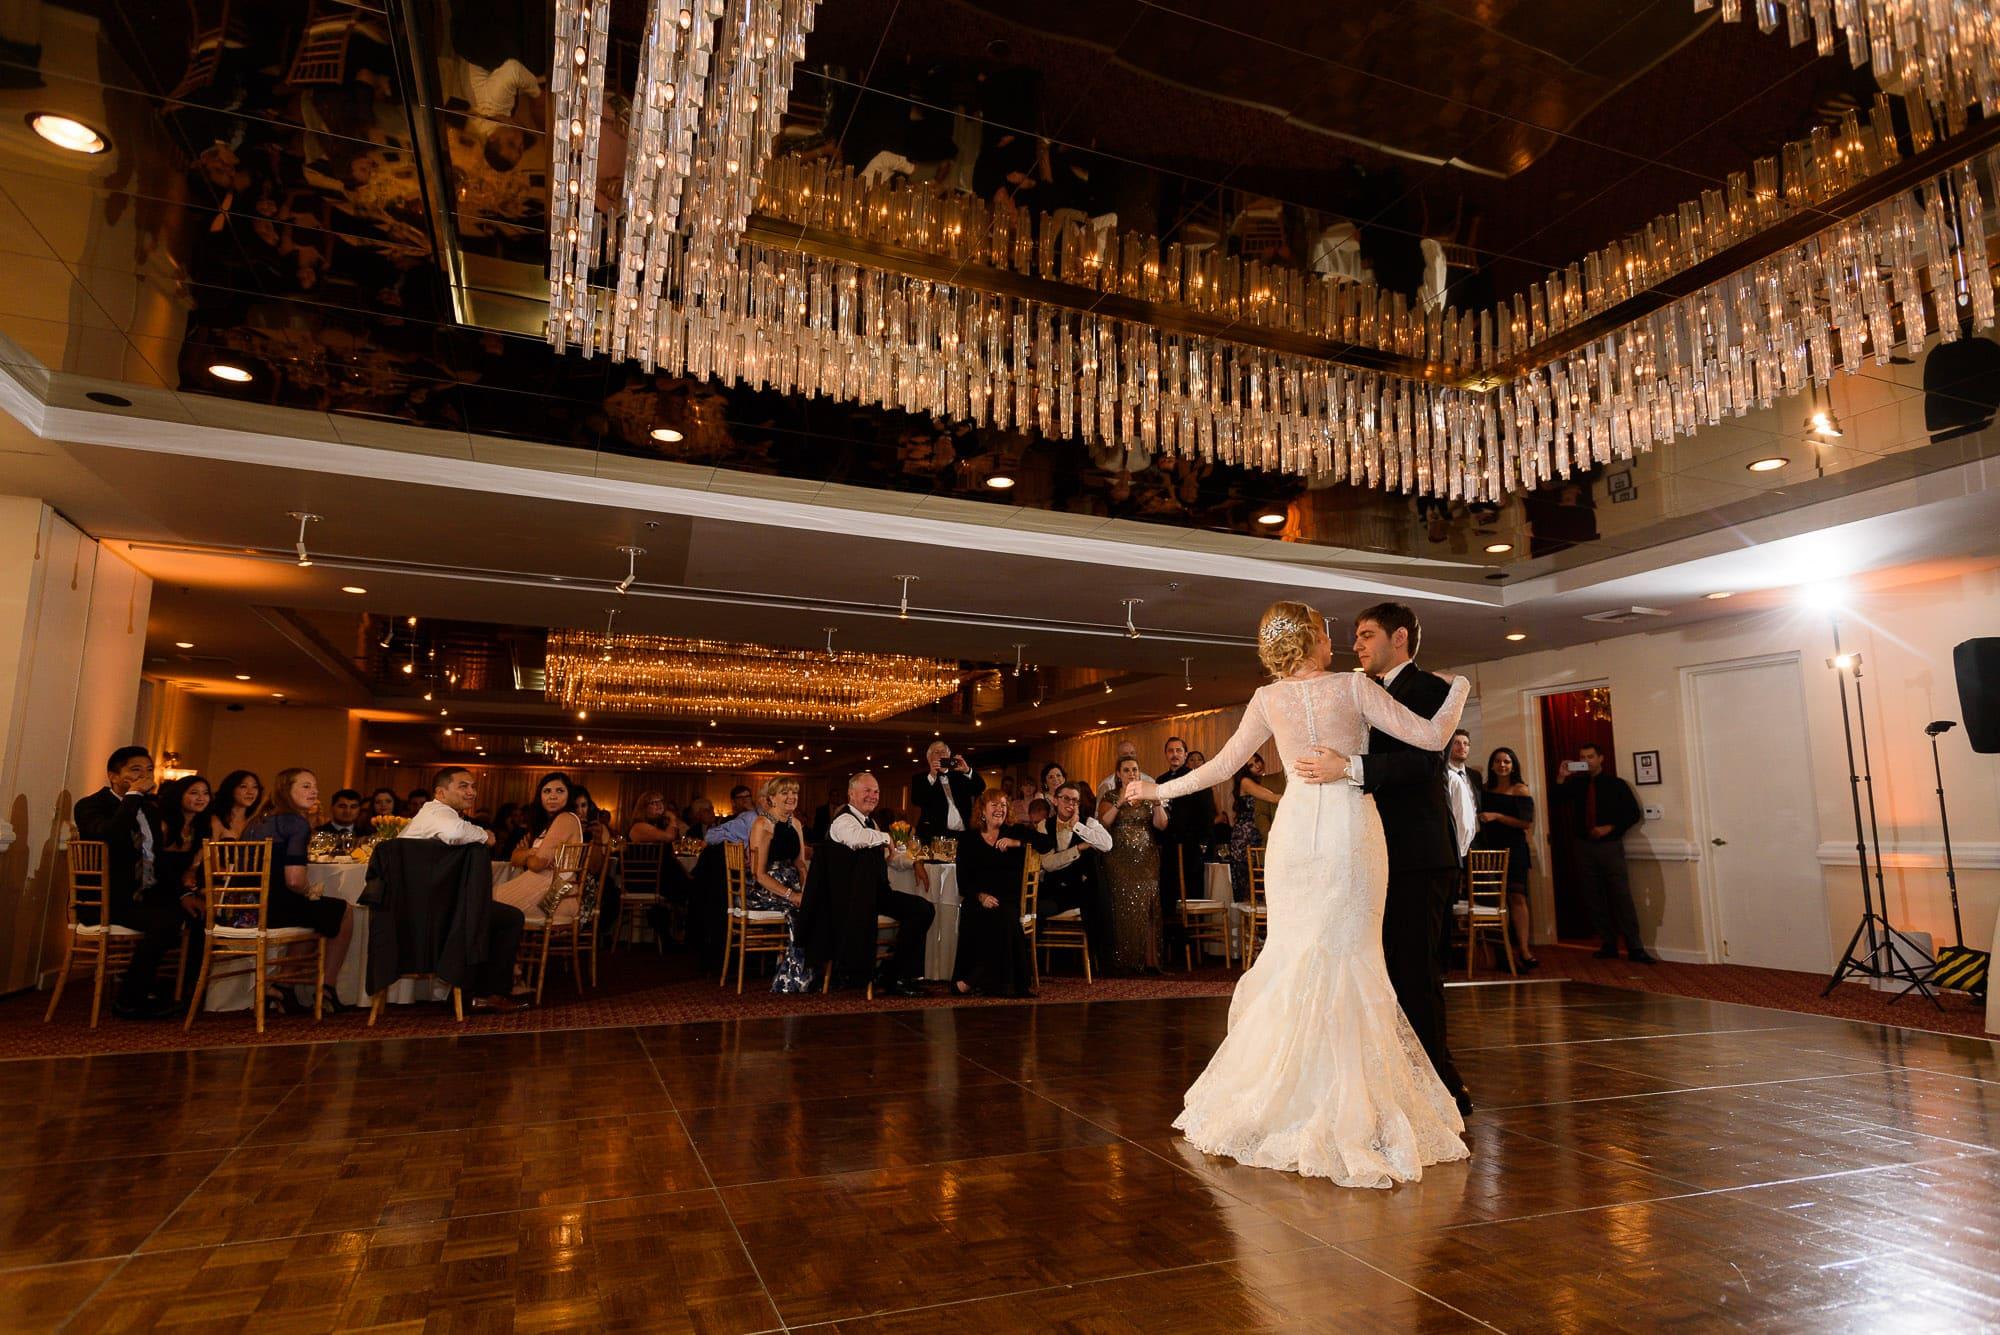 066_Alan_and_Heidi_Los_Angeles_Equestrian_Center_Wedding